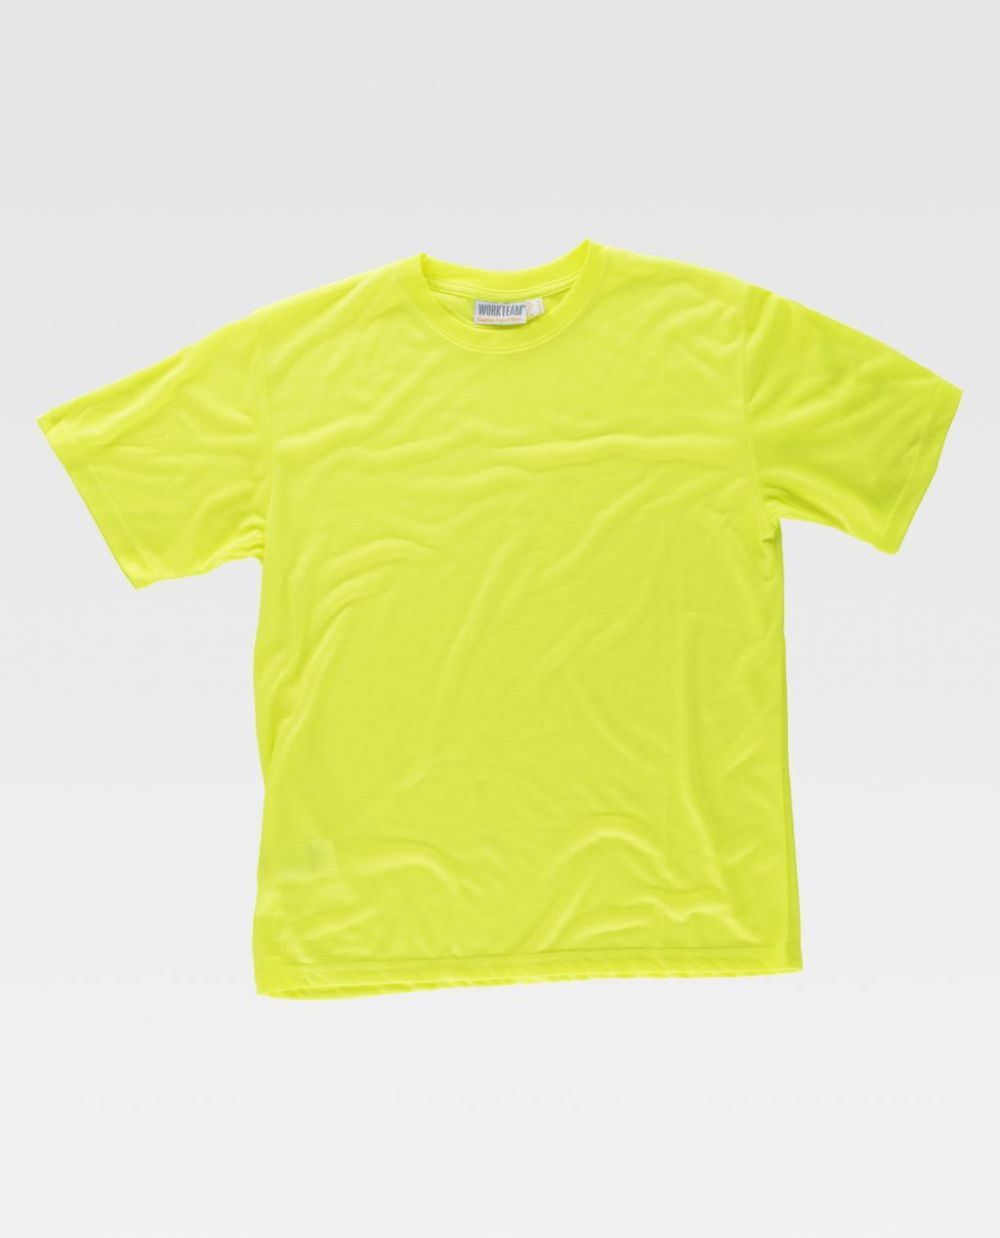 Camisetas reflectante workteam alta visbilidad mc de poliéster para personalizar vista 1